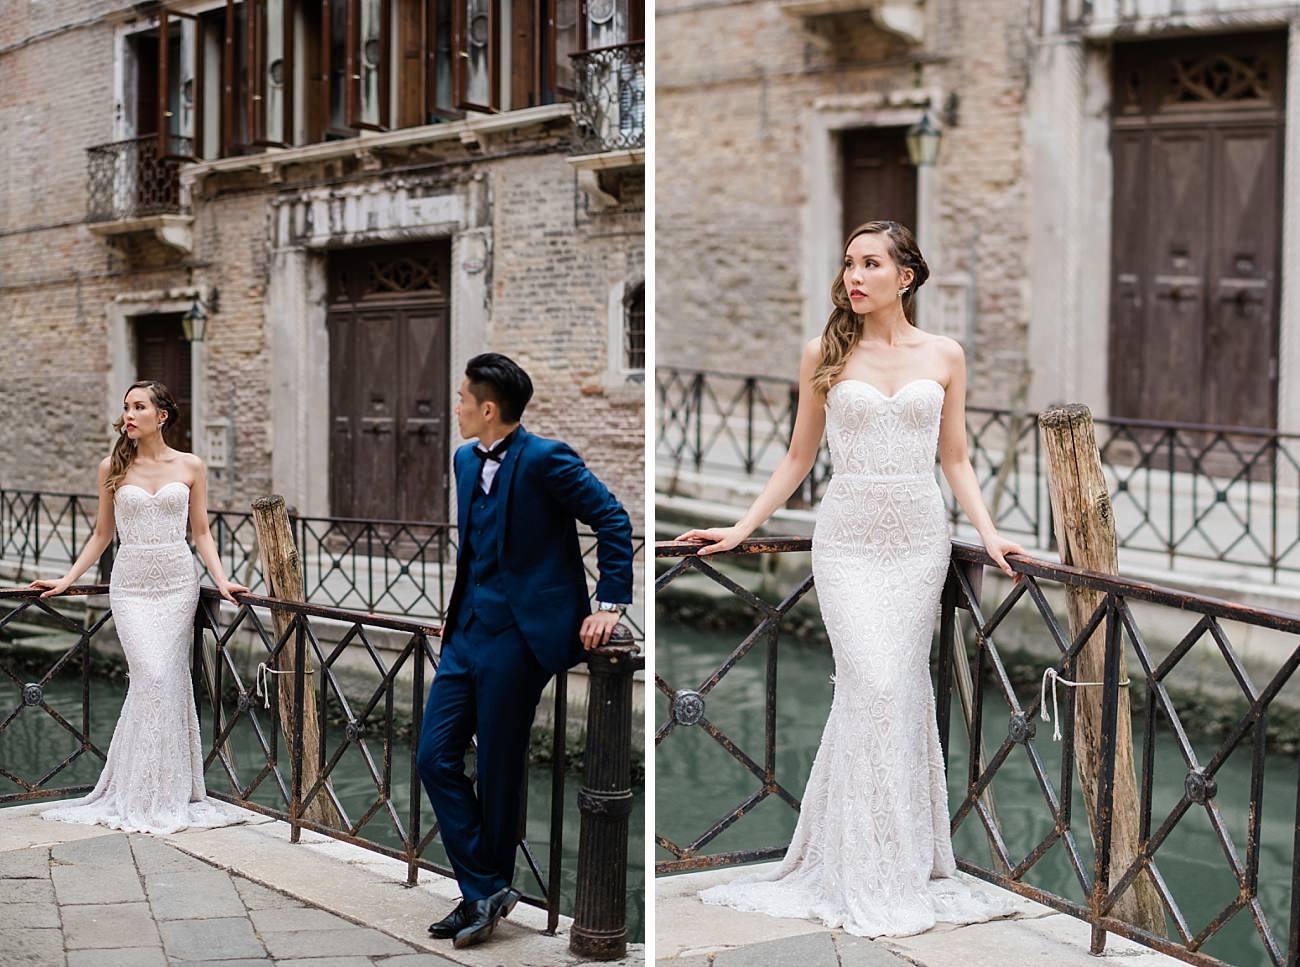 In the City of Love / Wedding Photos Venice